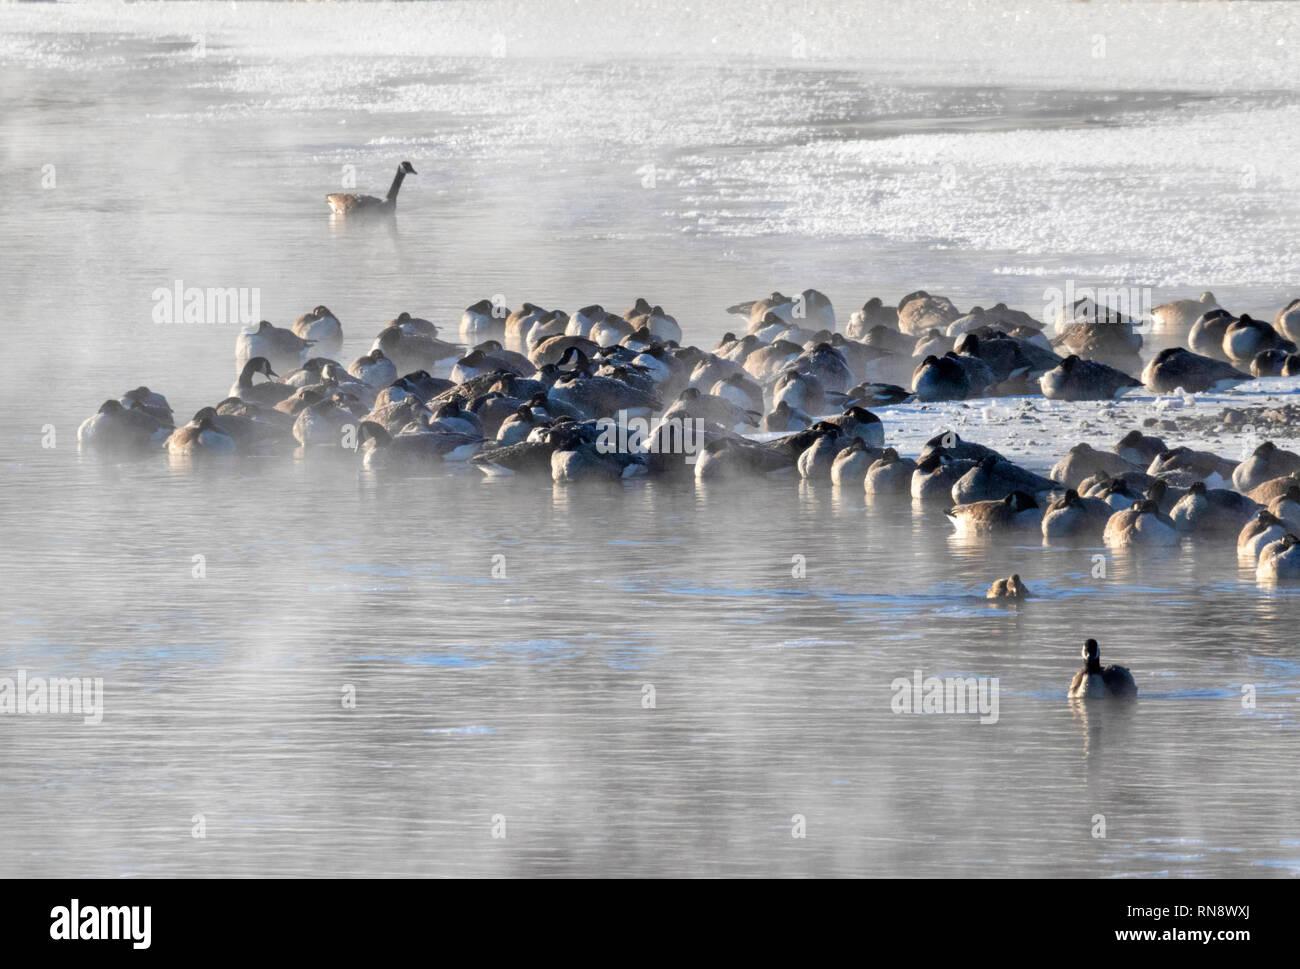 Canada geese (Branta canadensis) sleeping at the edge of freezing lake at cold winter morning, Iowa, USA - Stock Image